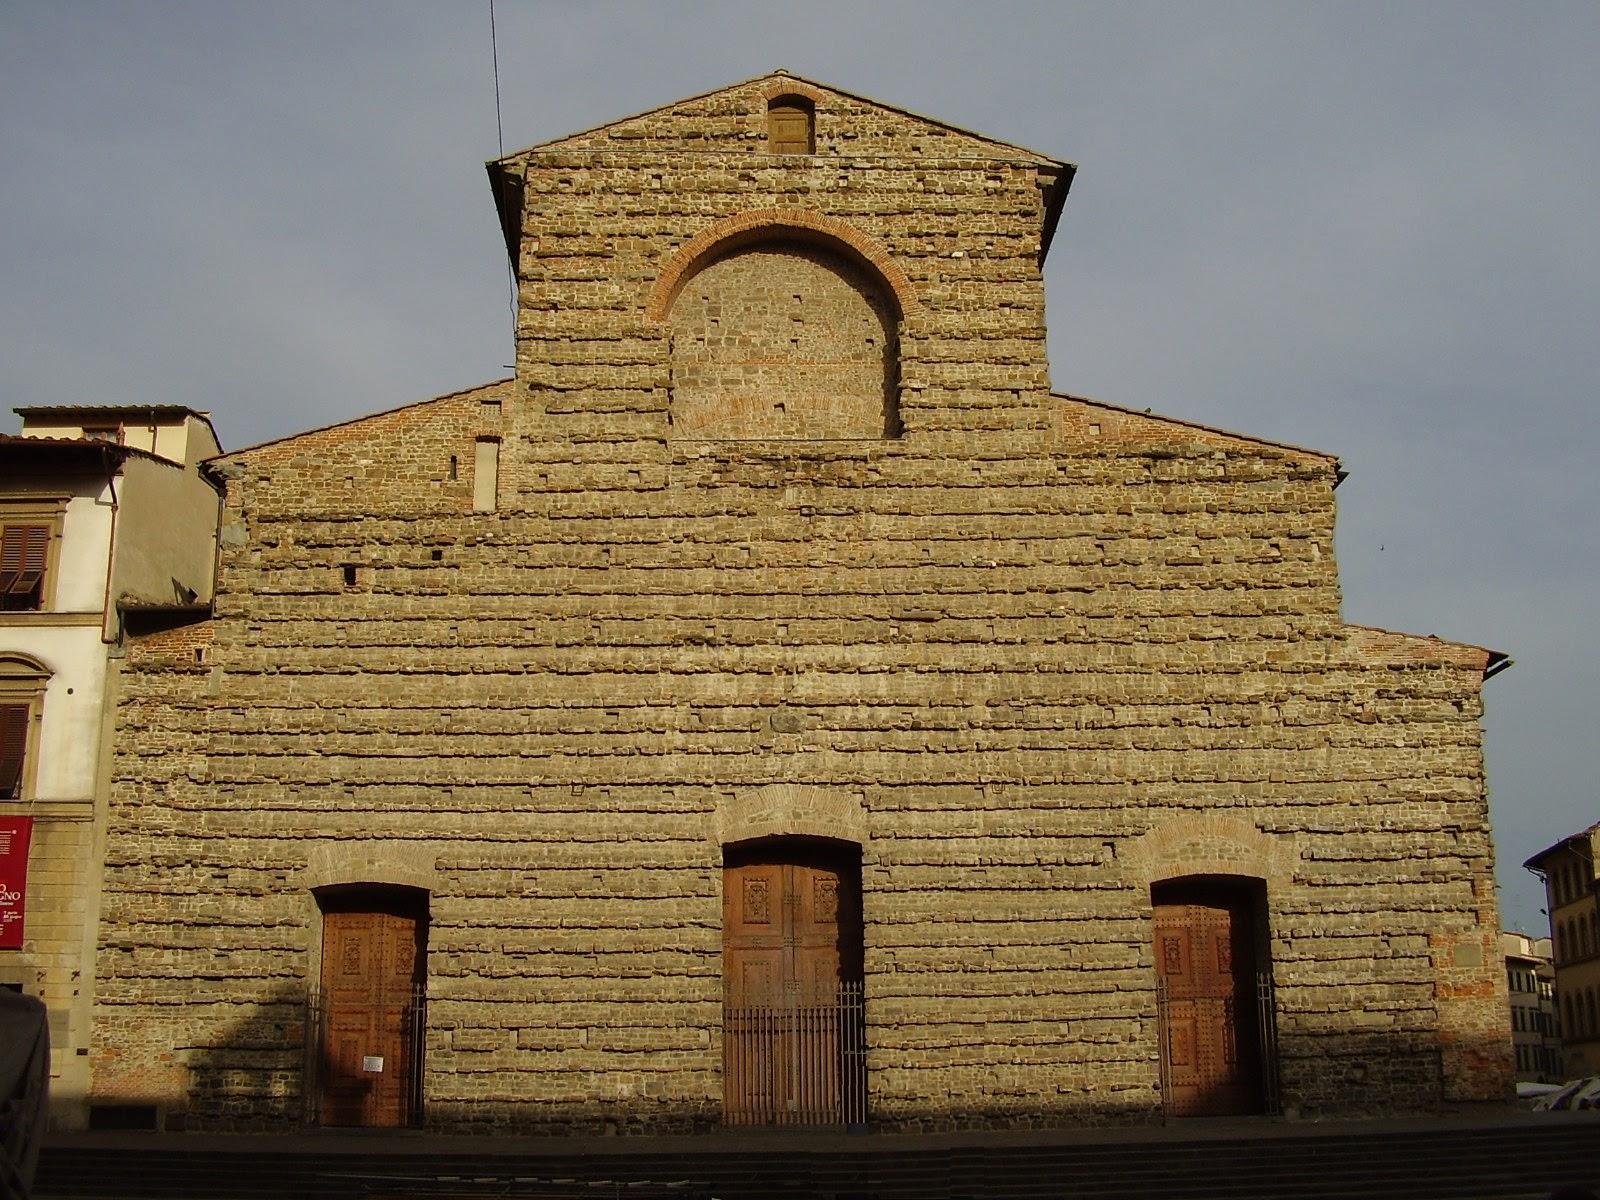 Basilica of San Lorenzo, la facciata, Firenze